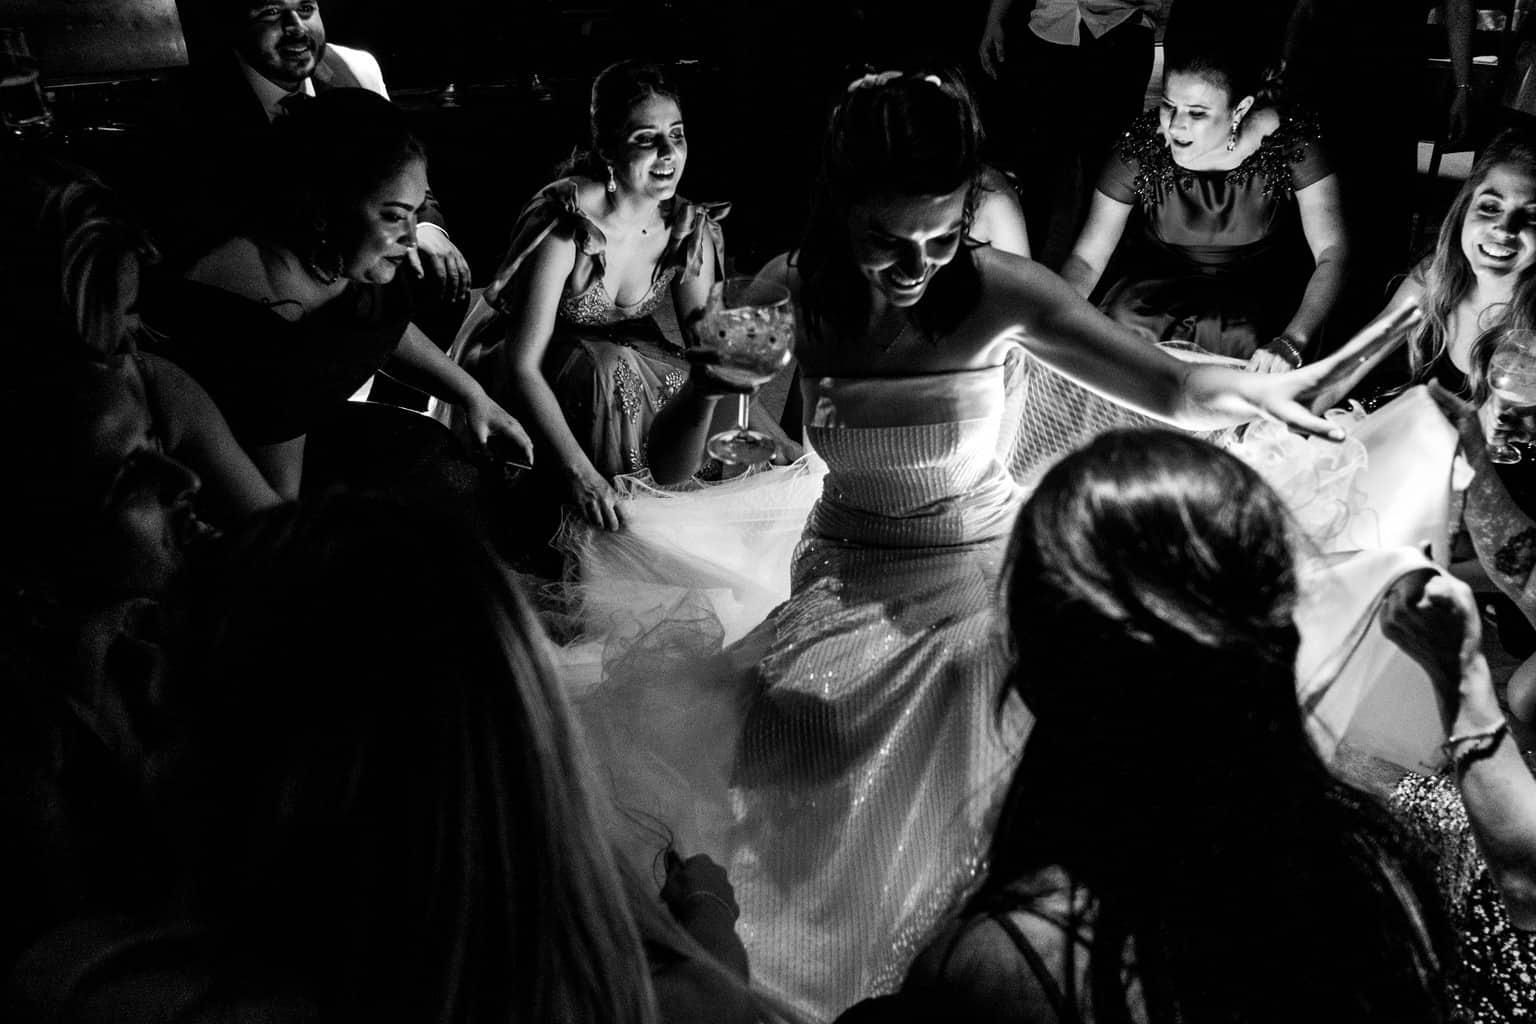 Bel-Benkler-eventos-Casamento-Ariane-e-Matheus-cerimonia-decoracao-contemporanea-fotografia-Rafael-Bigarelli-noivos-na-pista-Spazio-Giardini-24